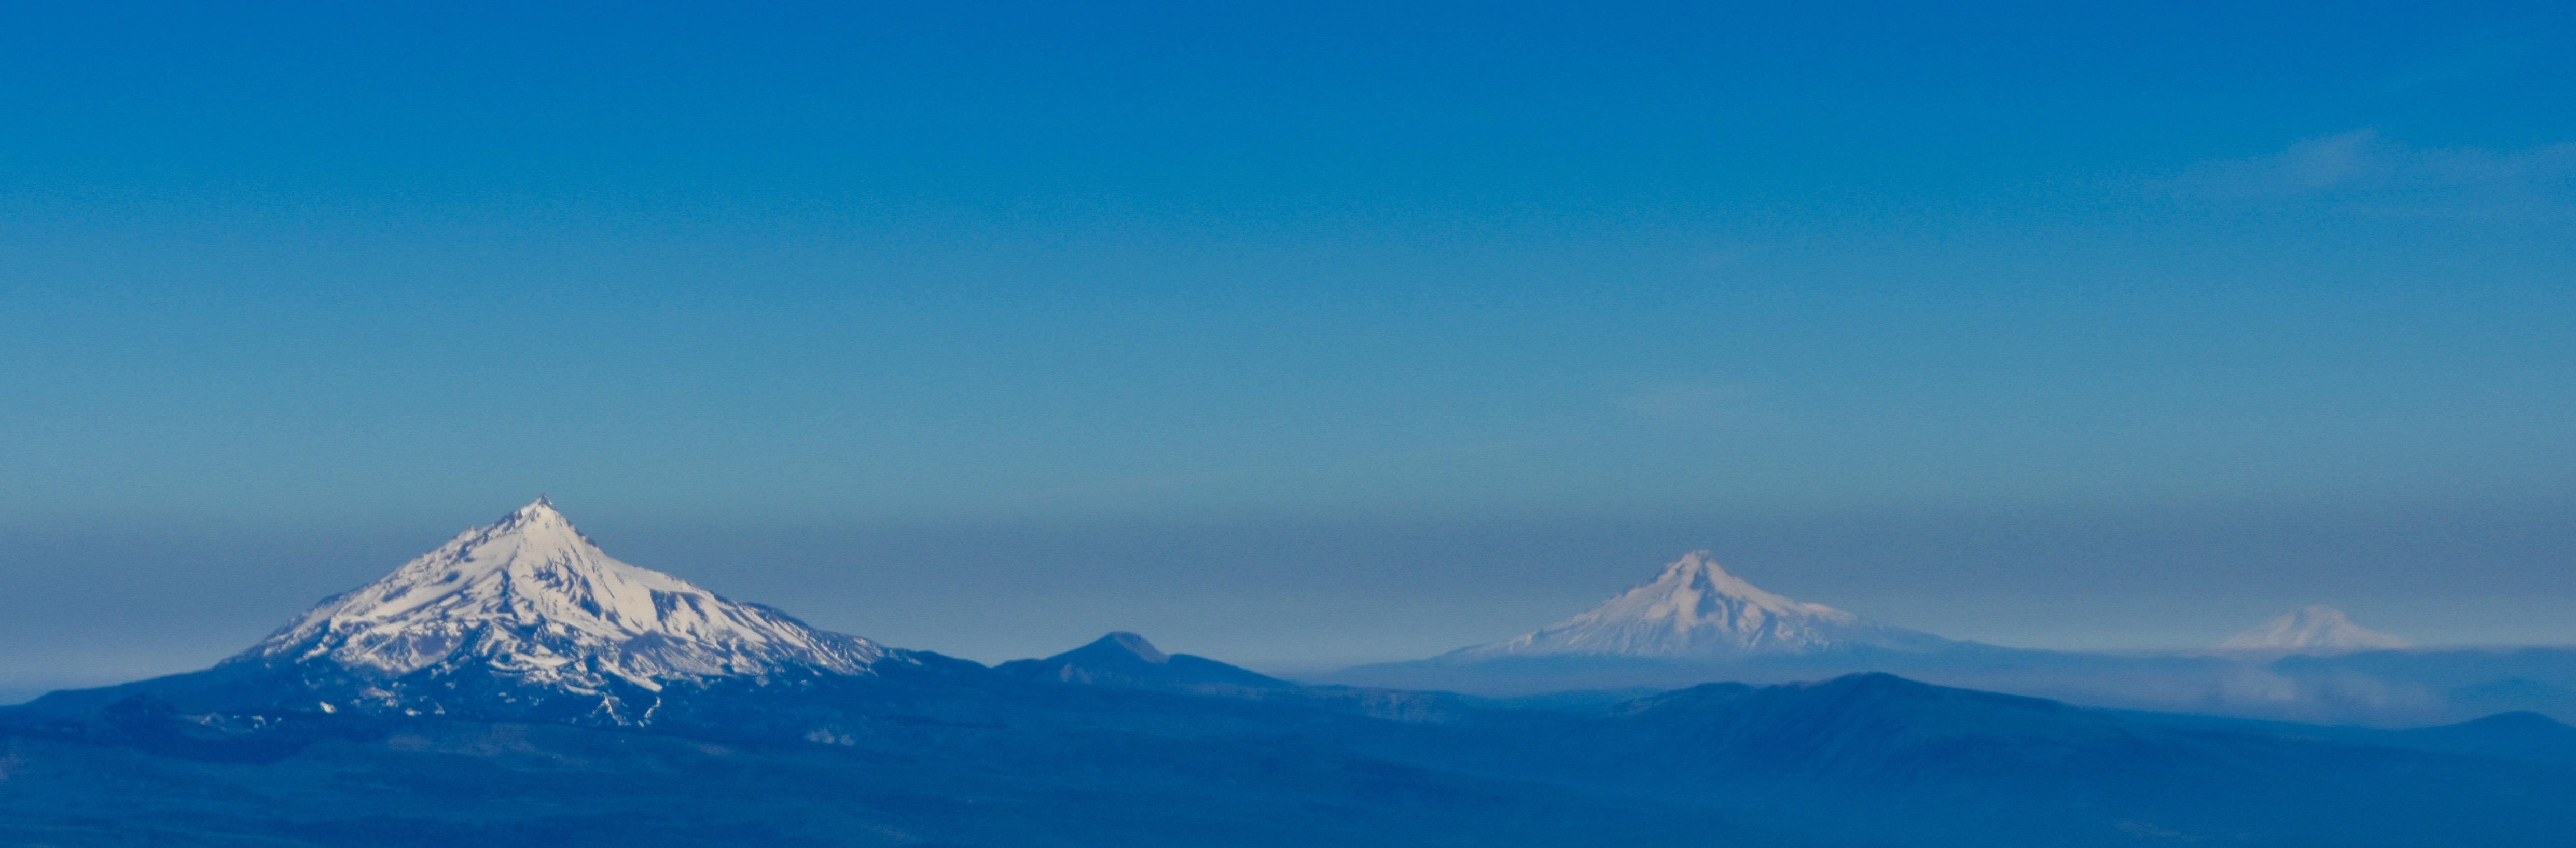 Mount Jefferson, Mount Washington and Mount Hood